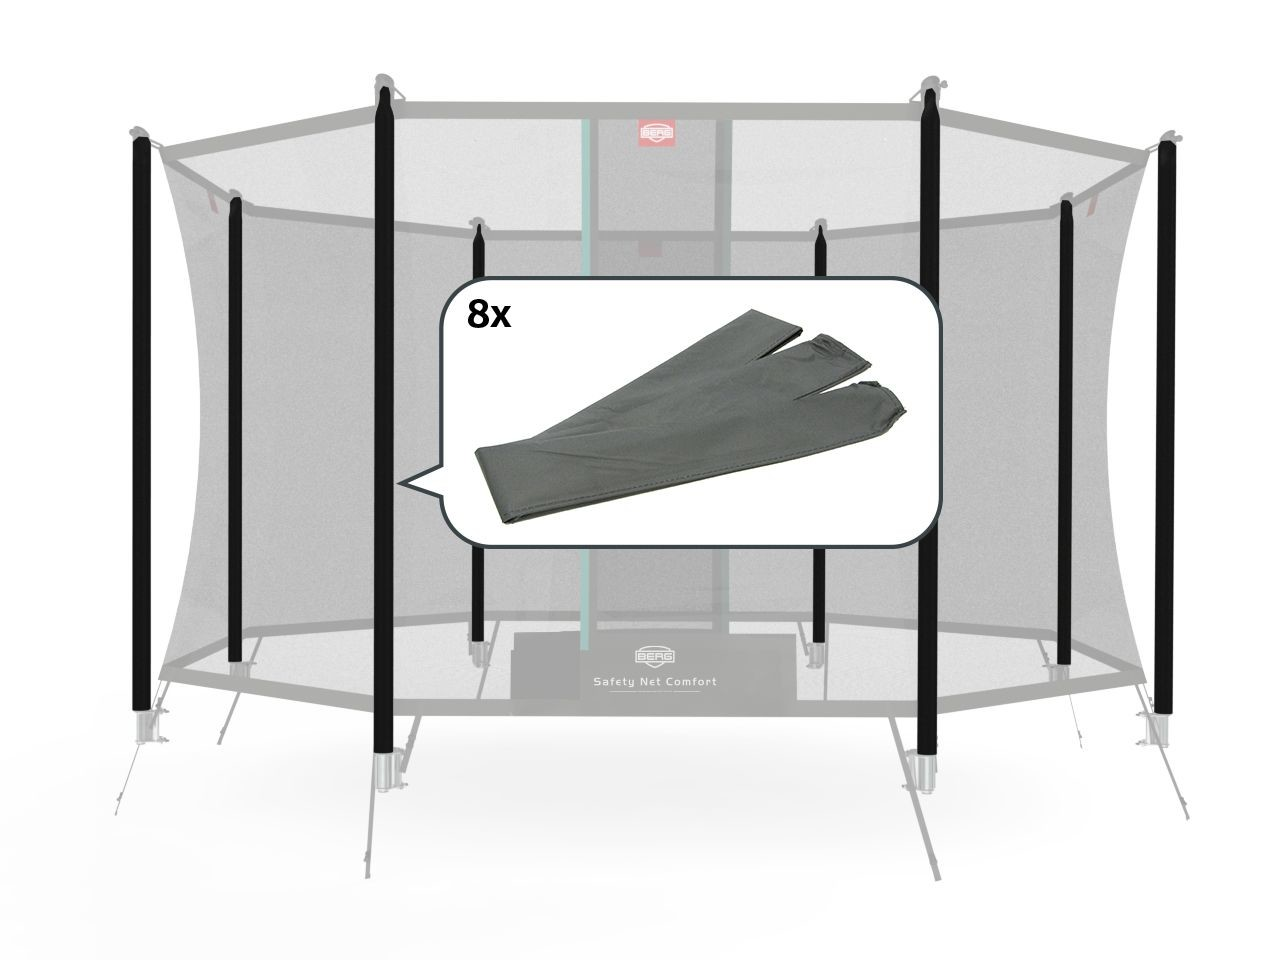 Safety Net Comfort - Set sleeves InGround (8x)